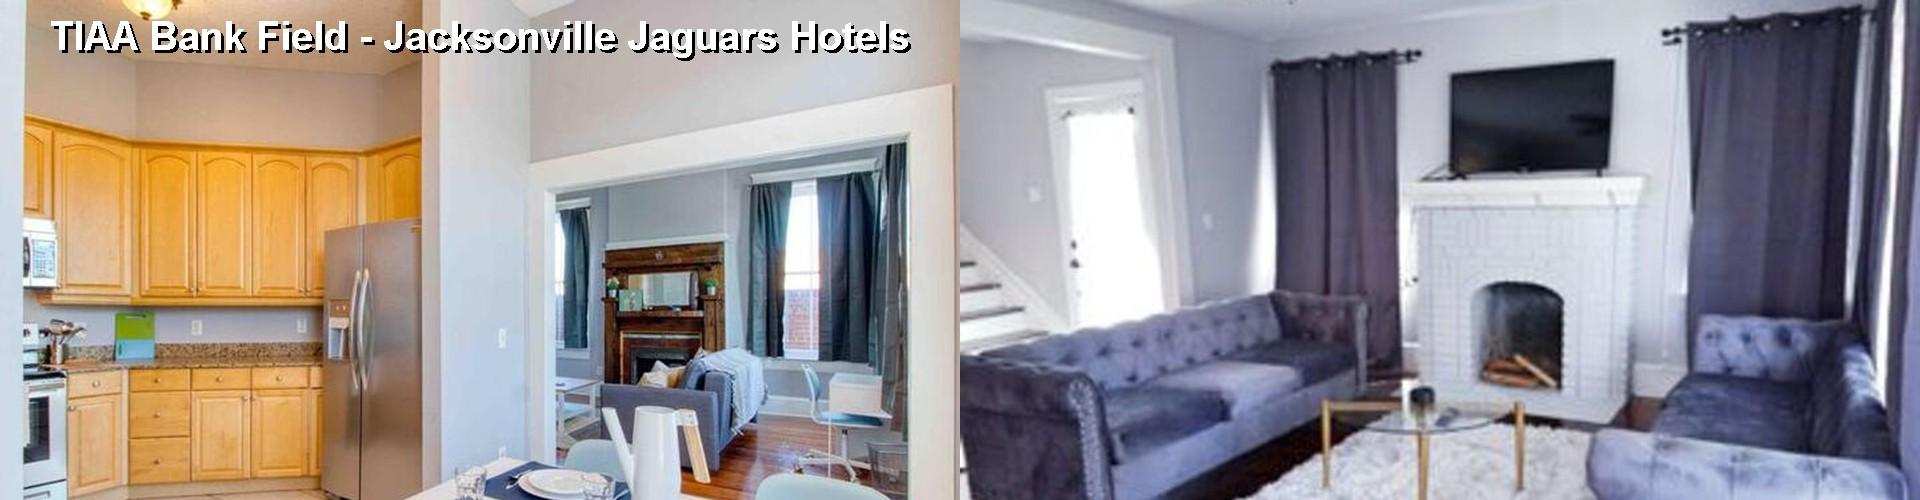 5 Best Hotels Near Jacksonville Munil Stadium Jaguars Alltel